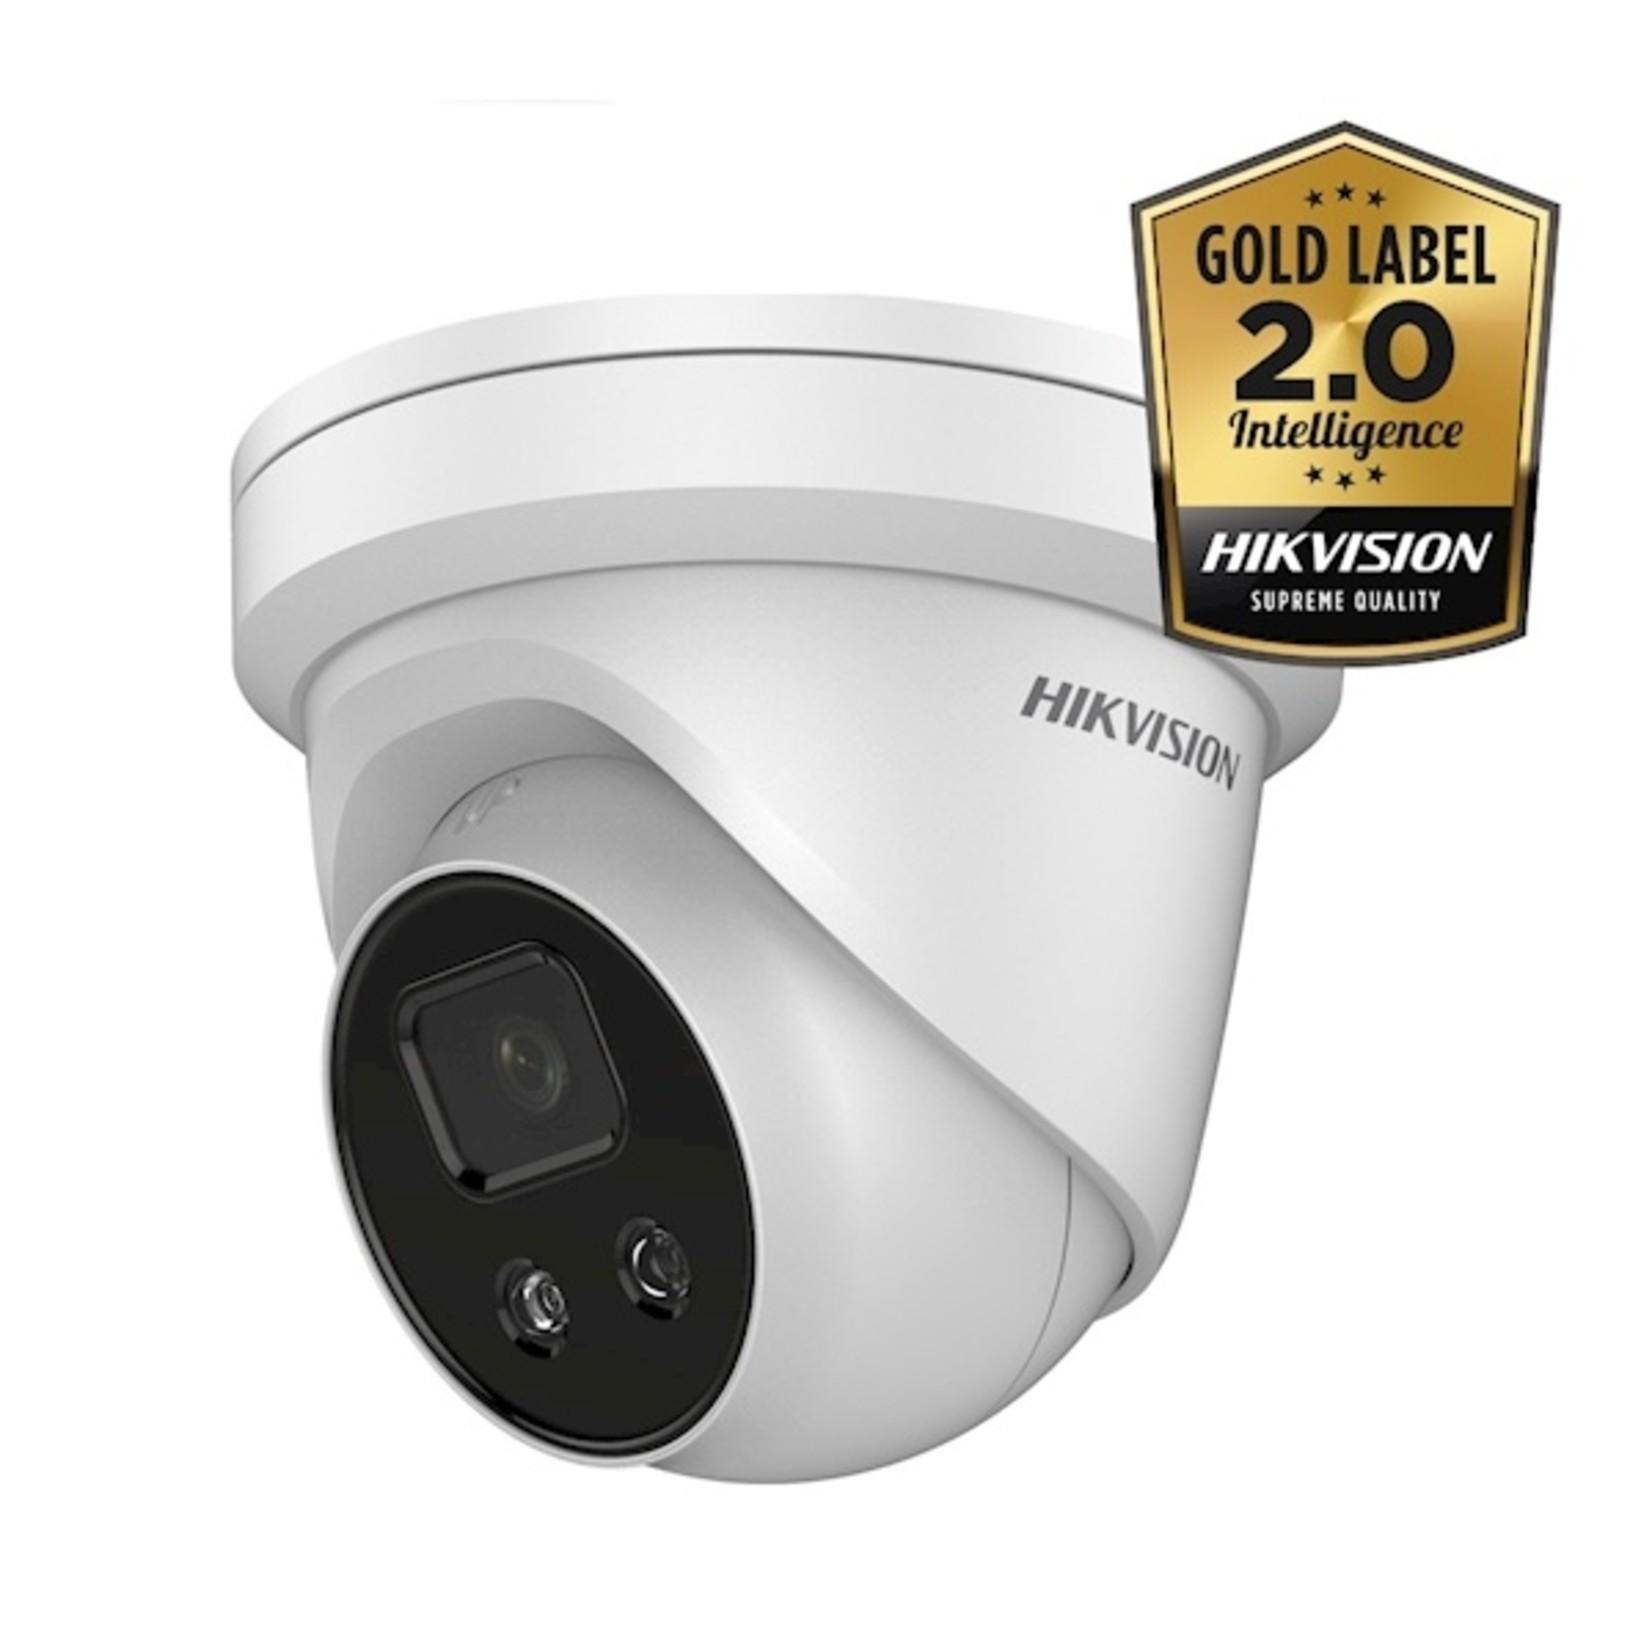 Hikvision DS-2CD2346G2-I, 4MP, 30m IR, WDR, Ultra Low Light